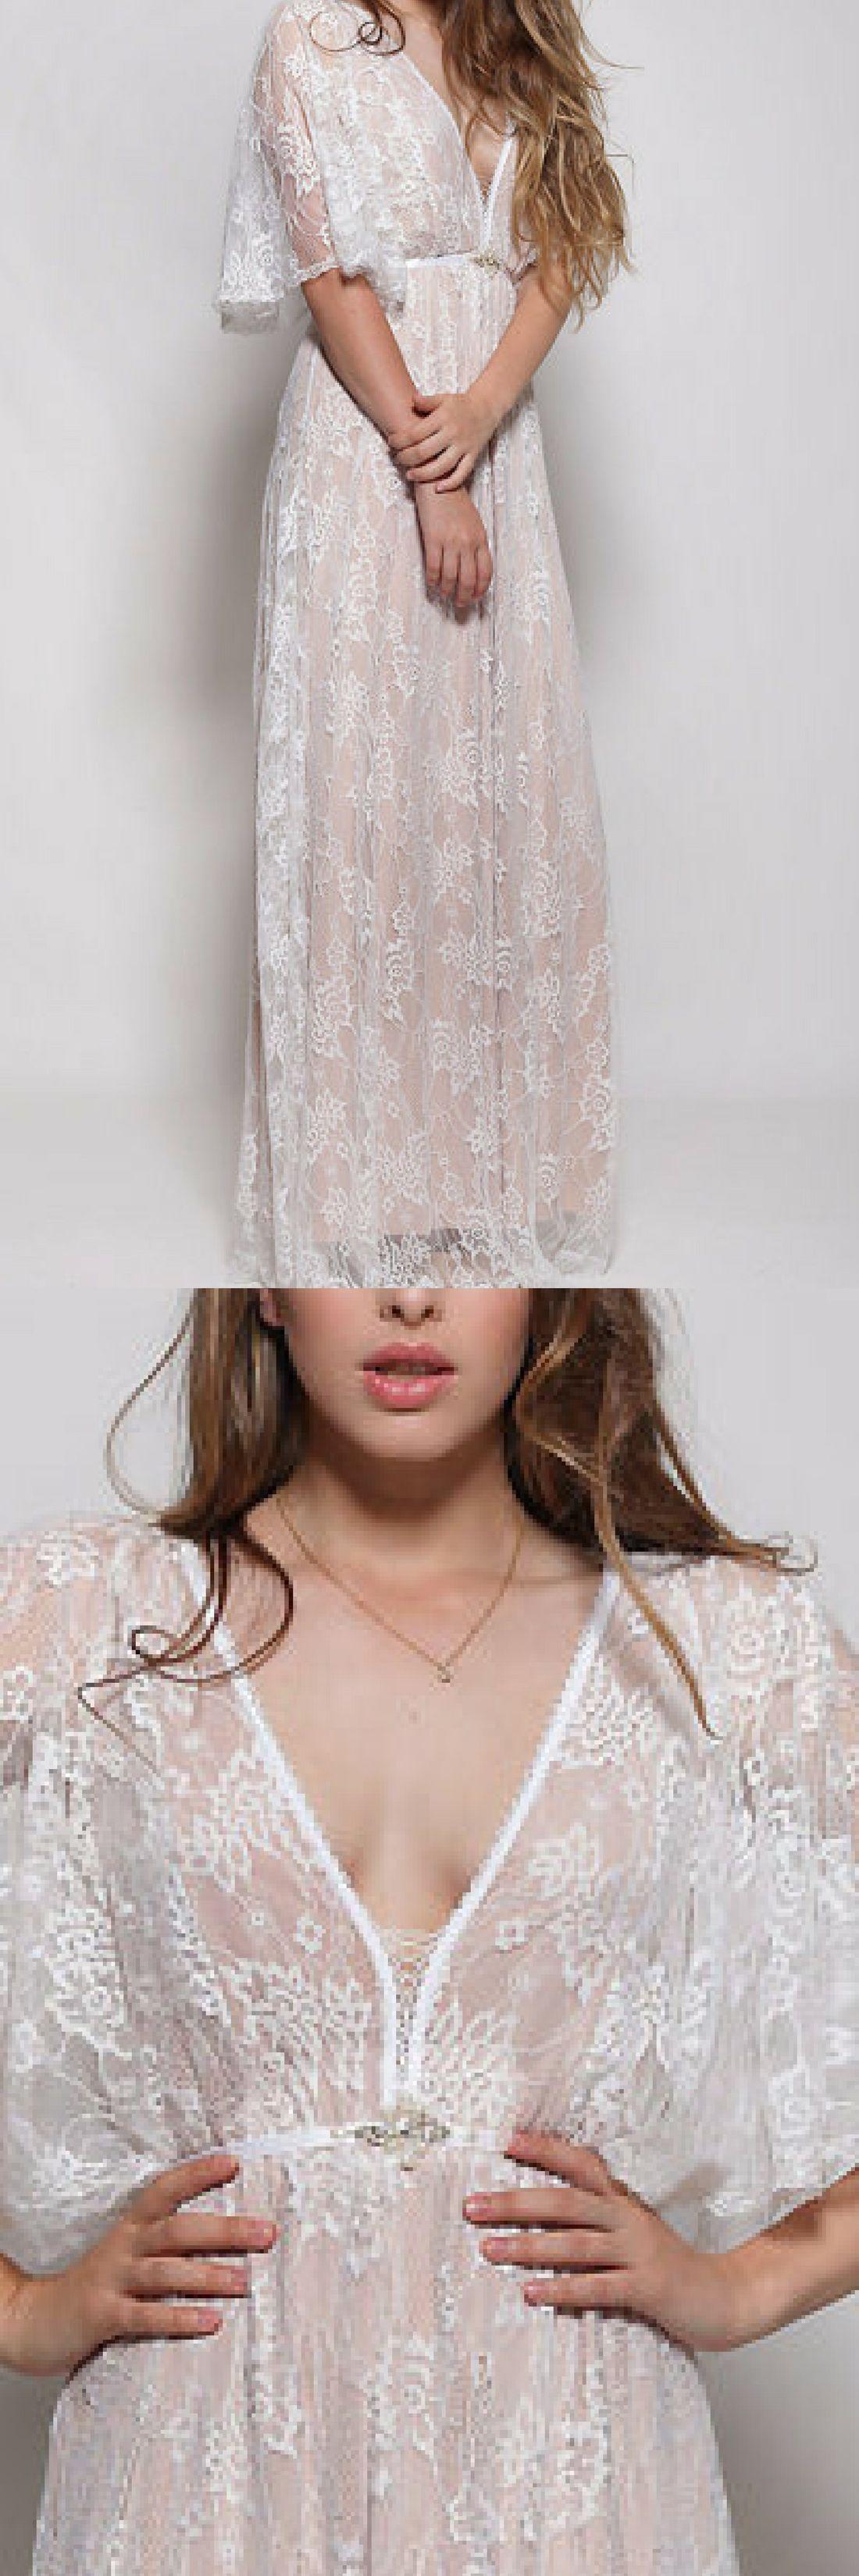 Lace wedding dress this amazing broken white bohemian wedding lace